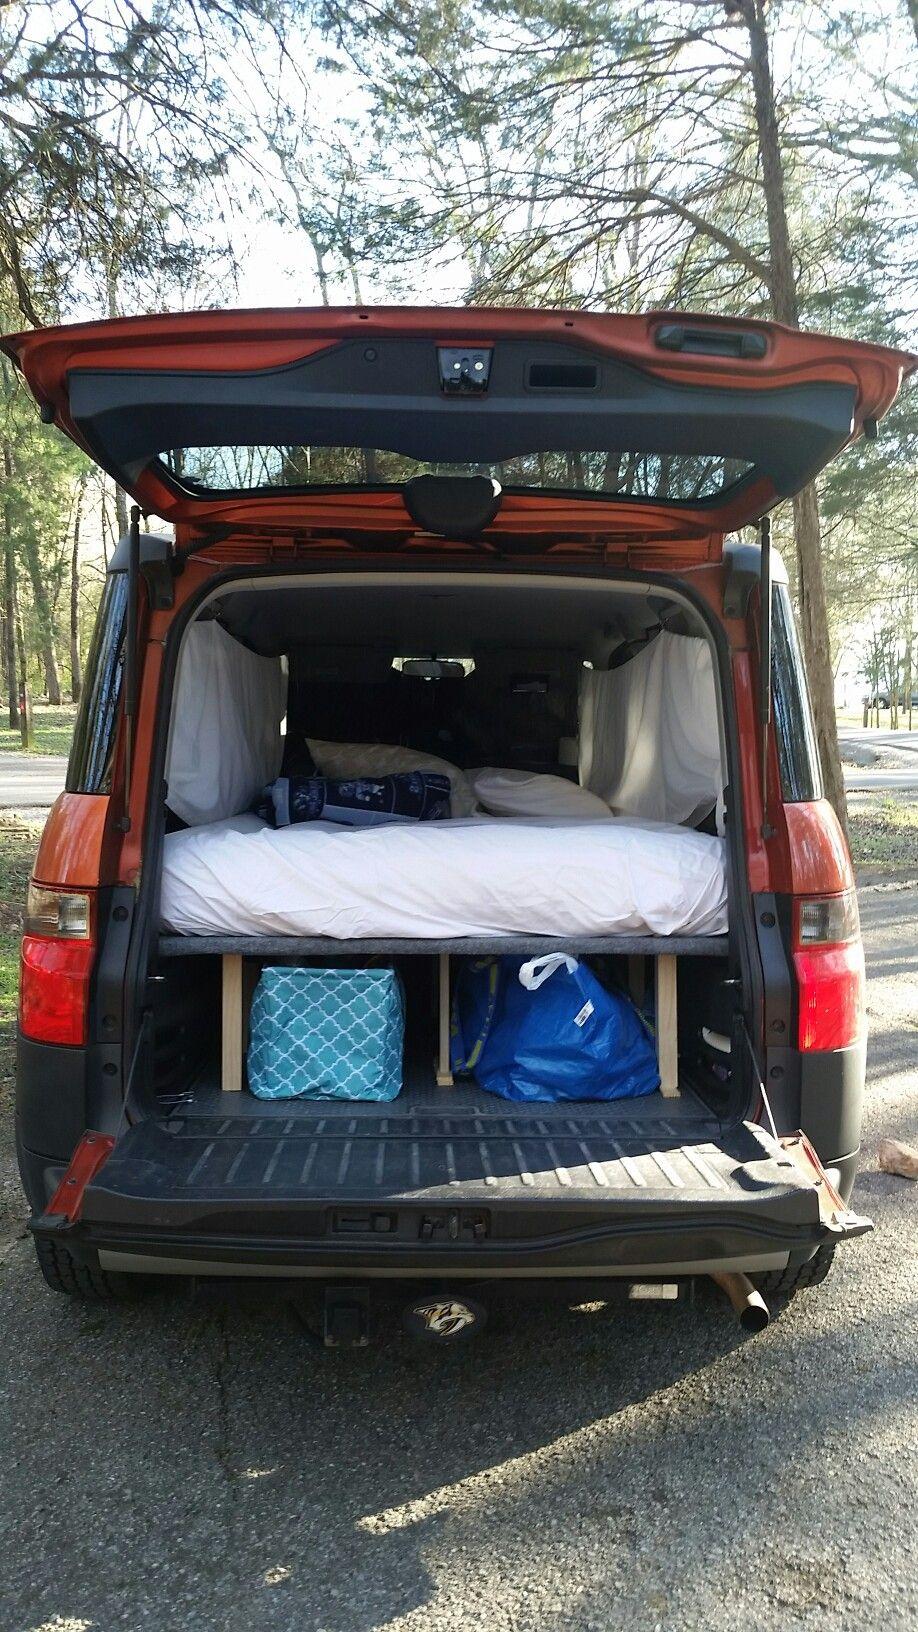 Car Camping [Hotelement]   Car Campin' [Hotelement]   Honda cars